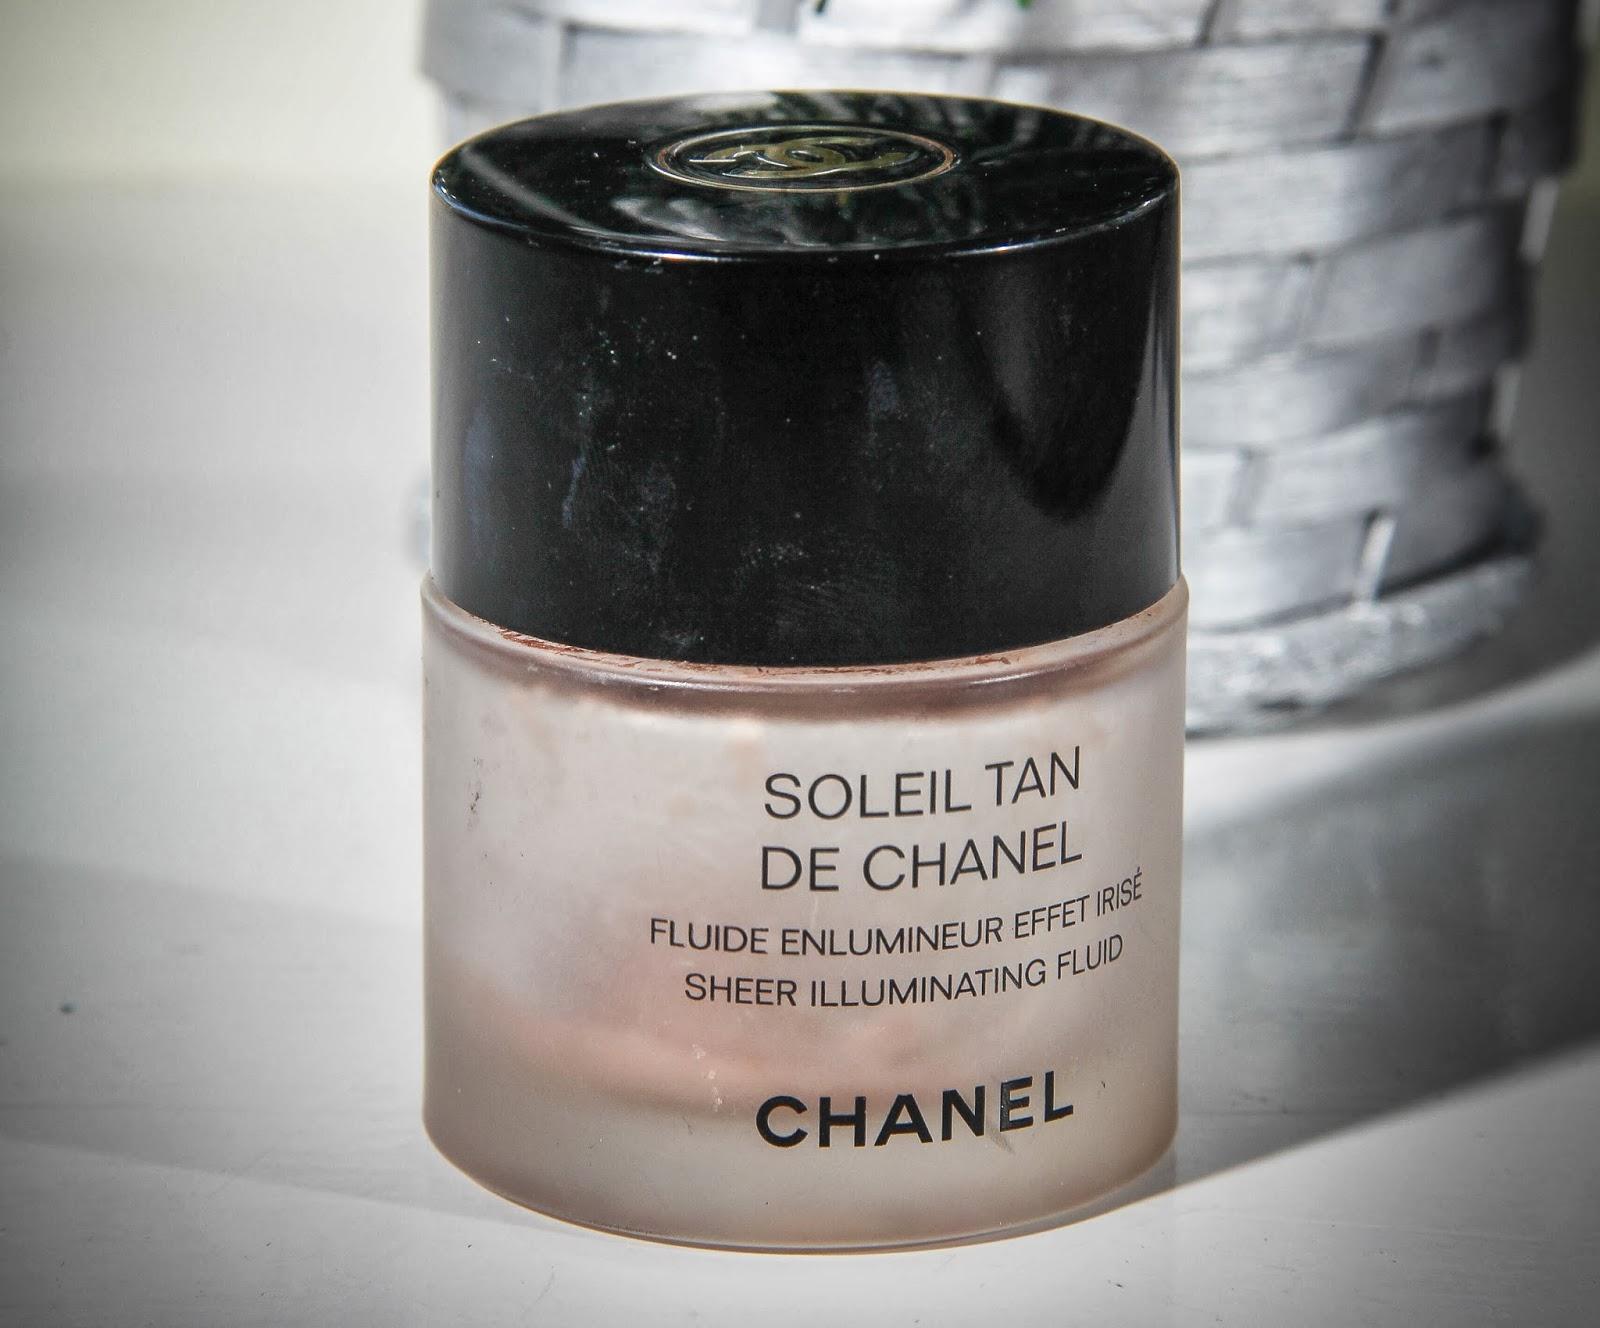 how to use soleil tan de chanel sheer illuminating fluid